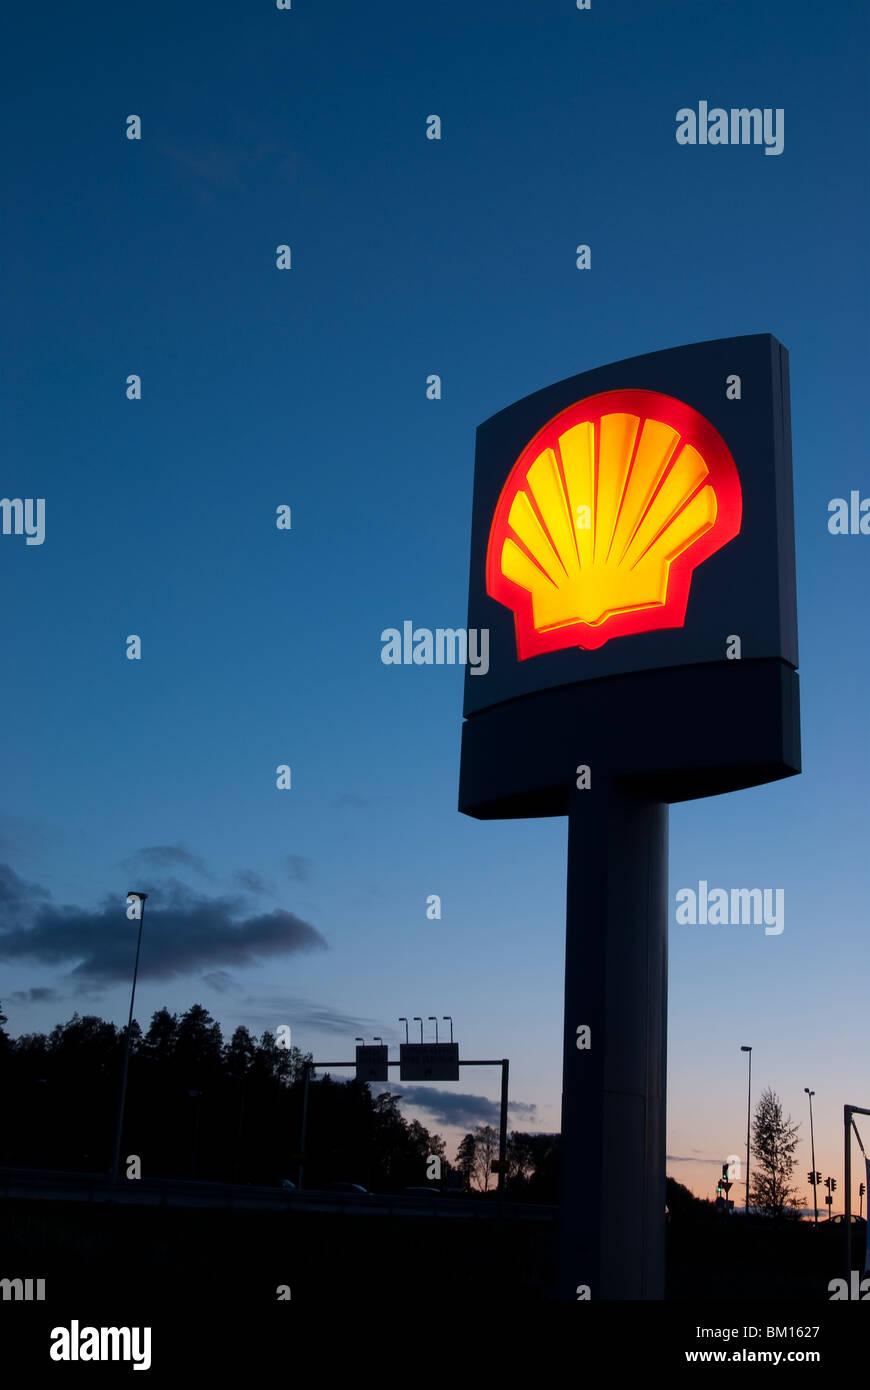 Illuminated Shell Oil sign at civil twilight - Stock Image